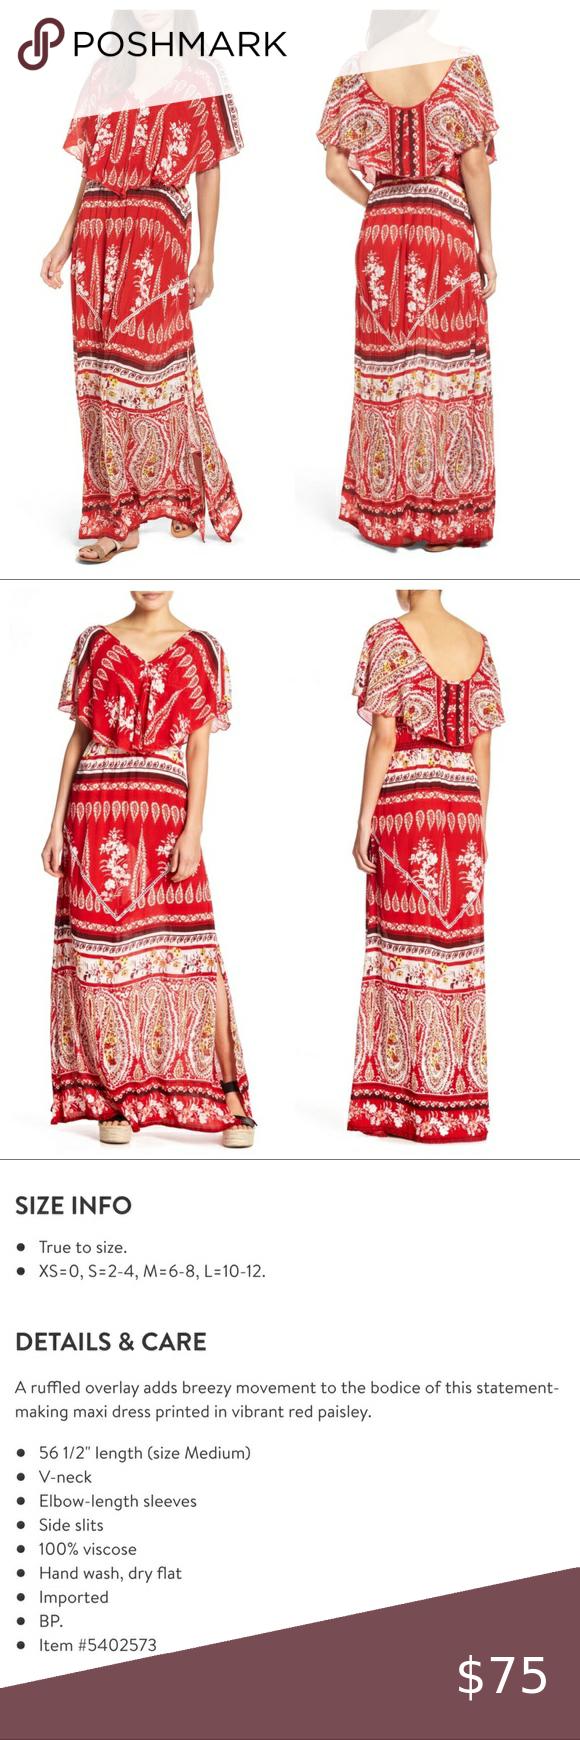 Nwt Raga Luisa Red Paisley Boho Viscose Maxi Dress New With Tags Retail 120 00 Gauzy Stretchy Material Viscose Maxi Dress Maxi Dress Cotton Maxi Dress Blue [ 1740 x 580 Pixel ]